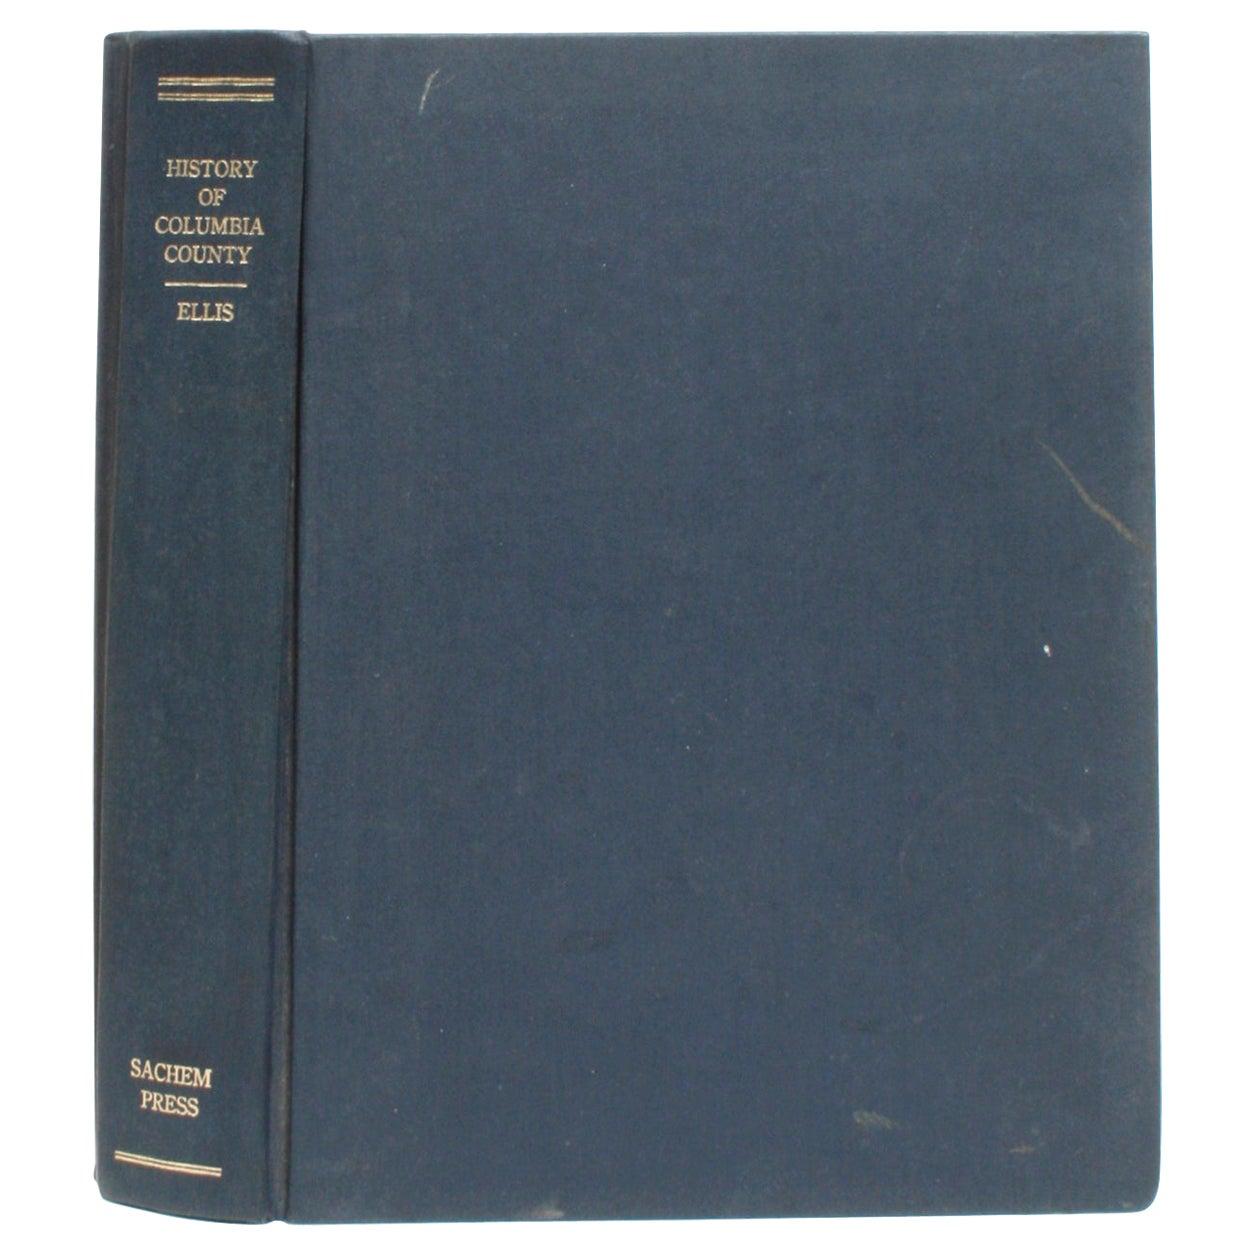 History of Columbia County New York